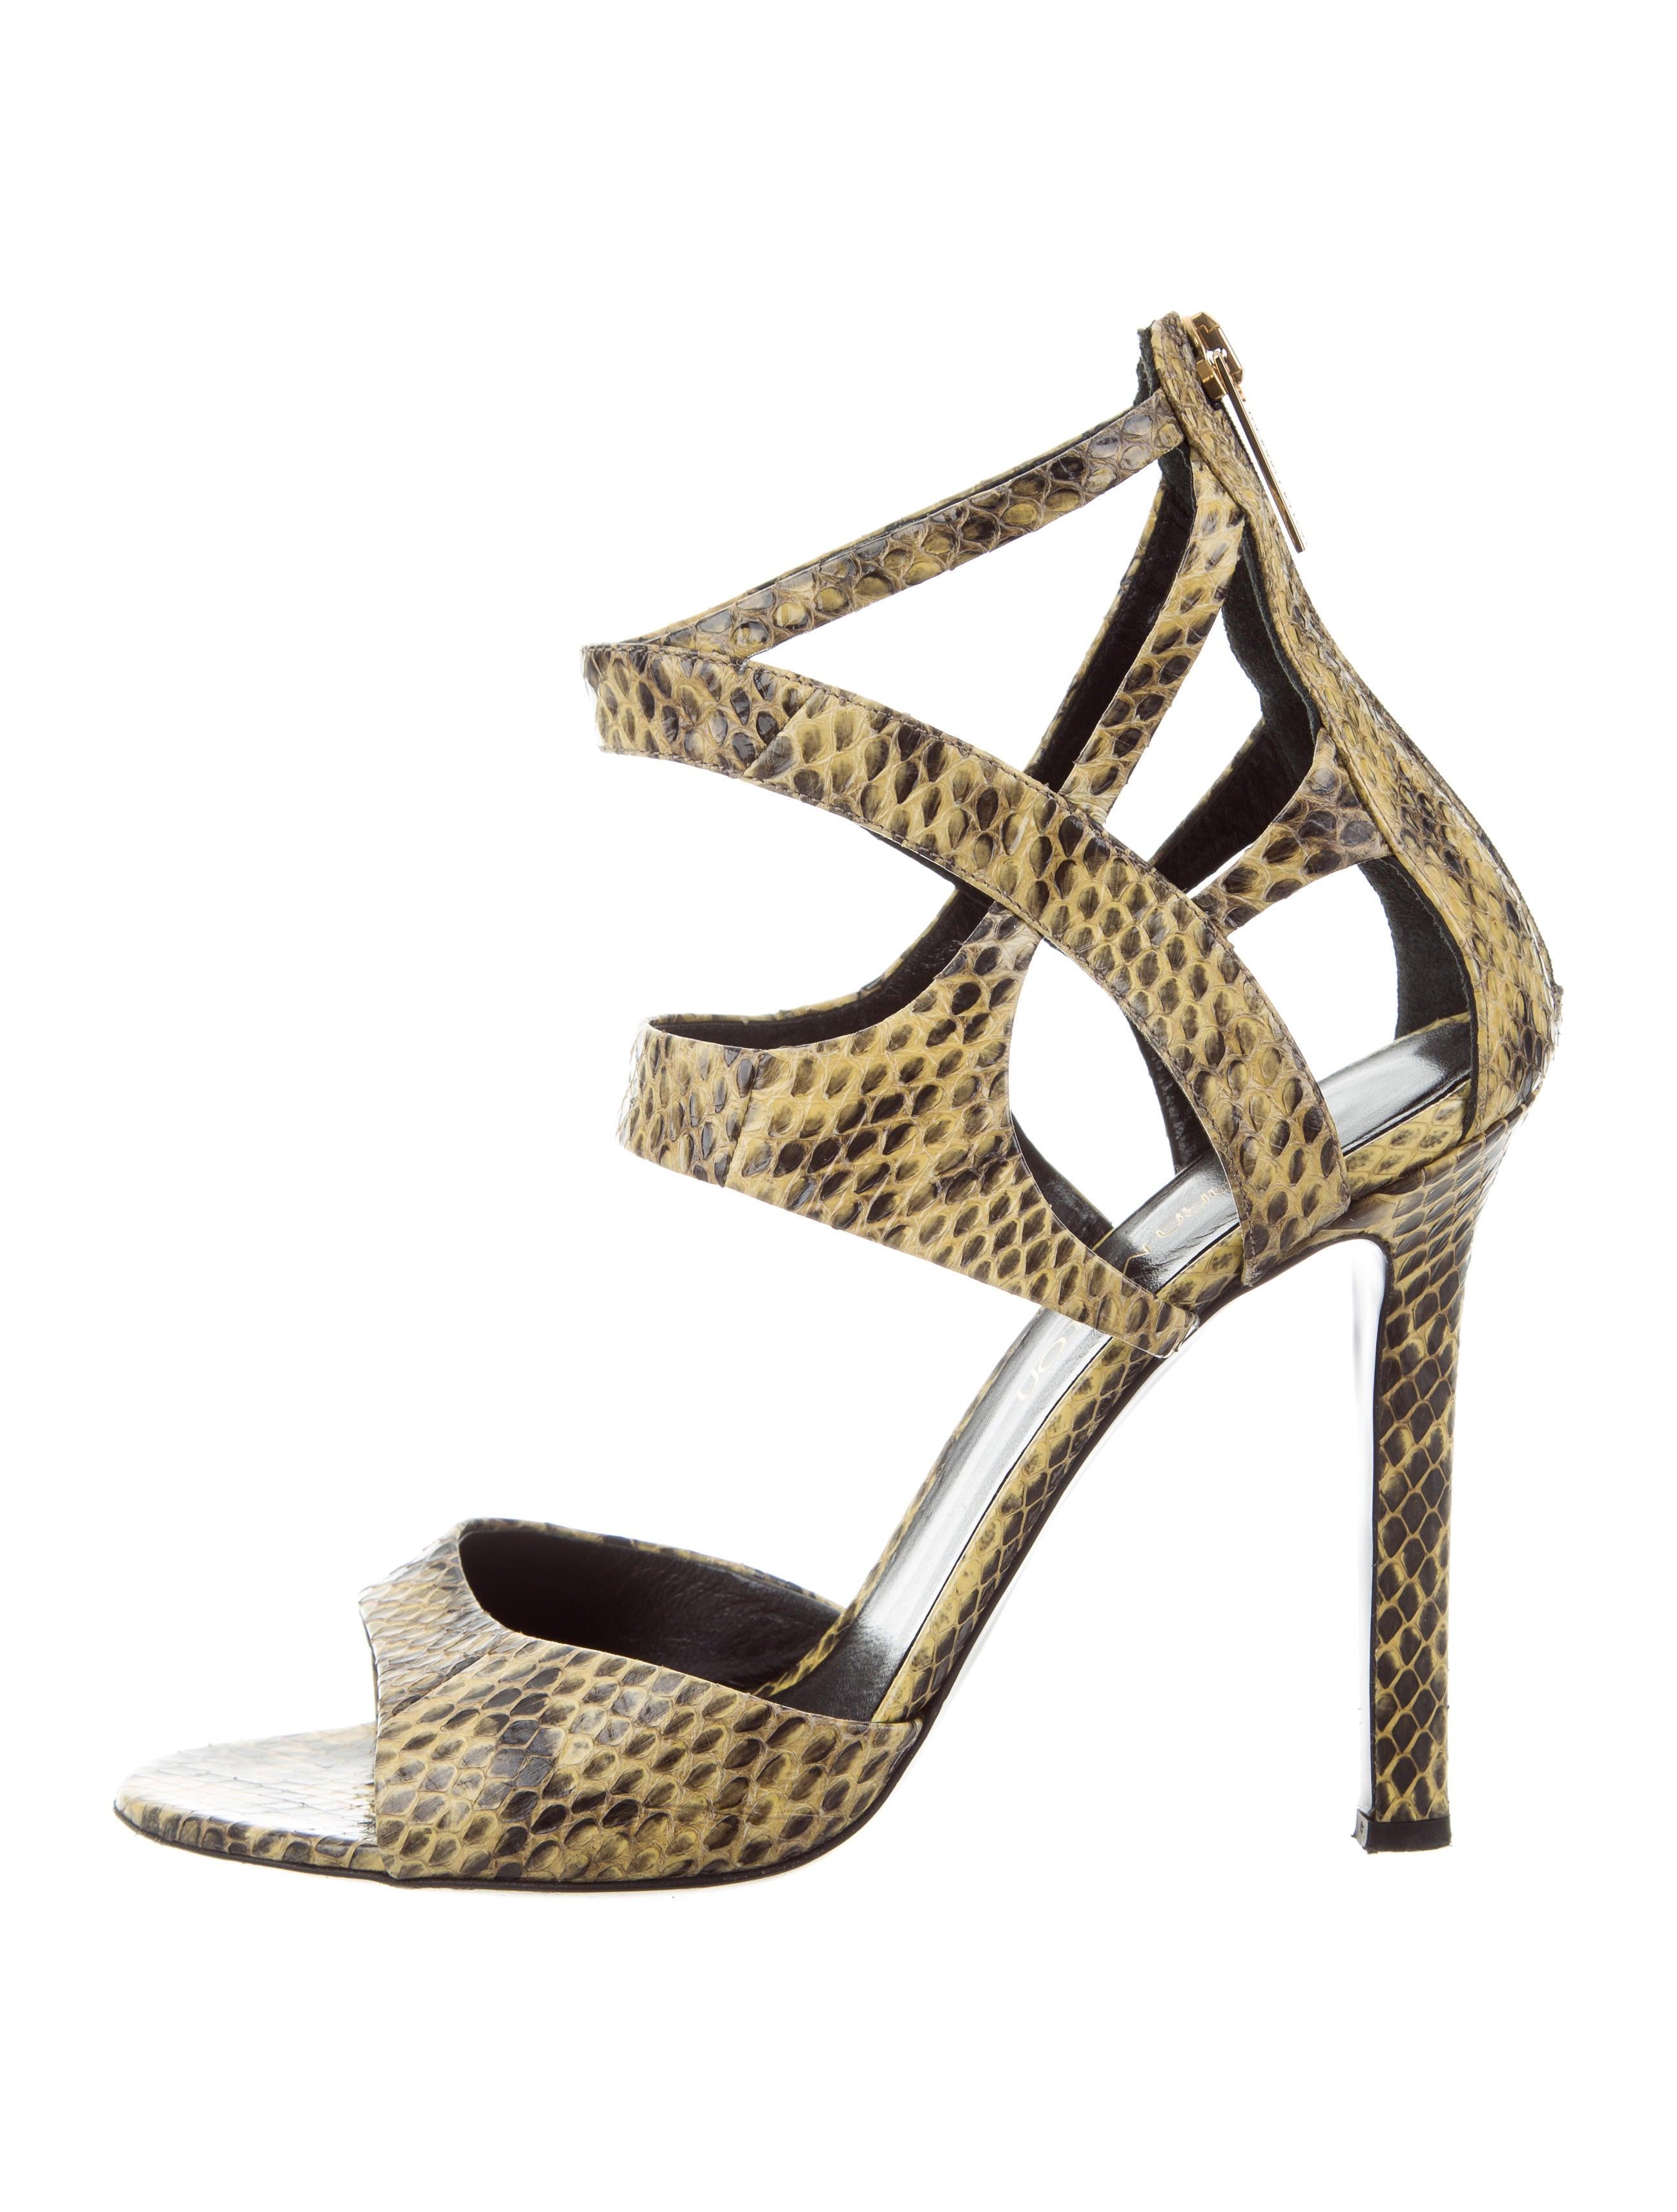 sale outlet Tamara Mellon Snakeskin Cutout Sandals footaction sale online DrBeaOMpk